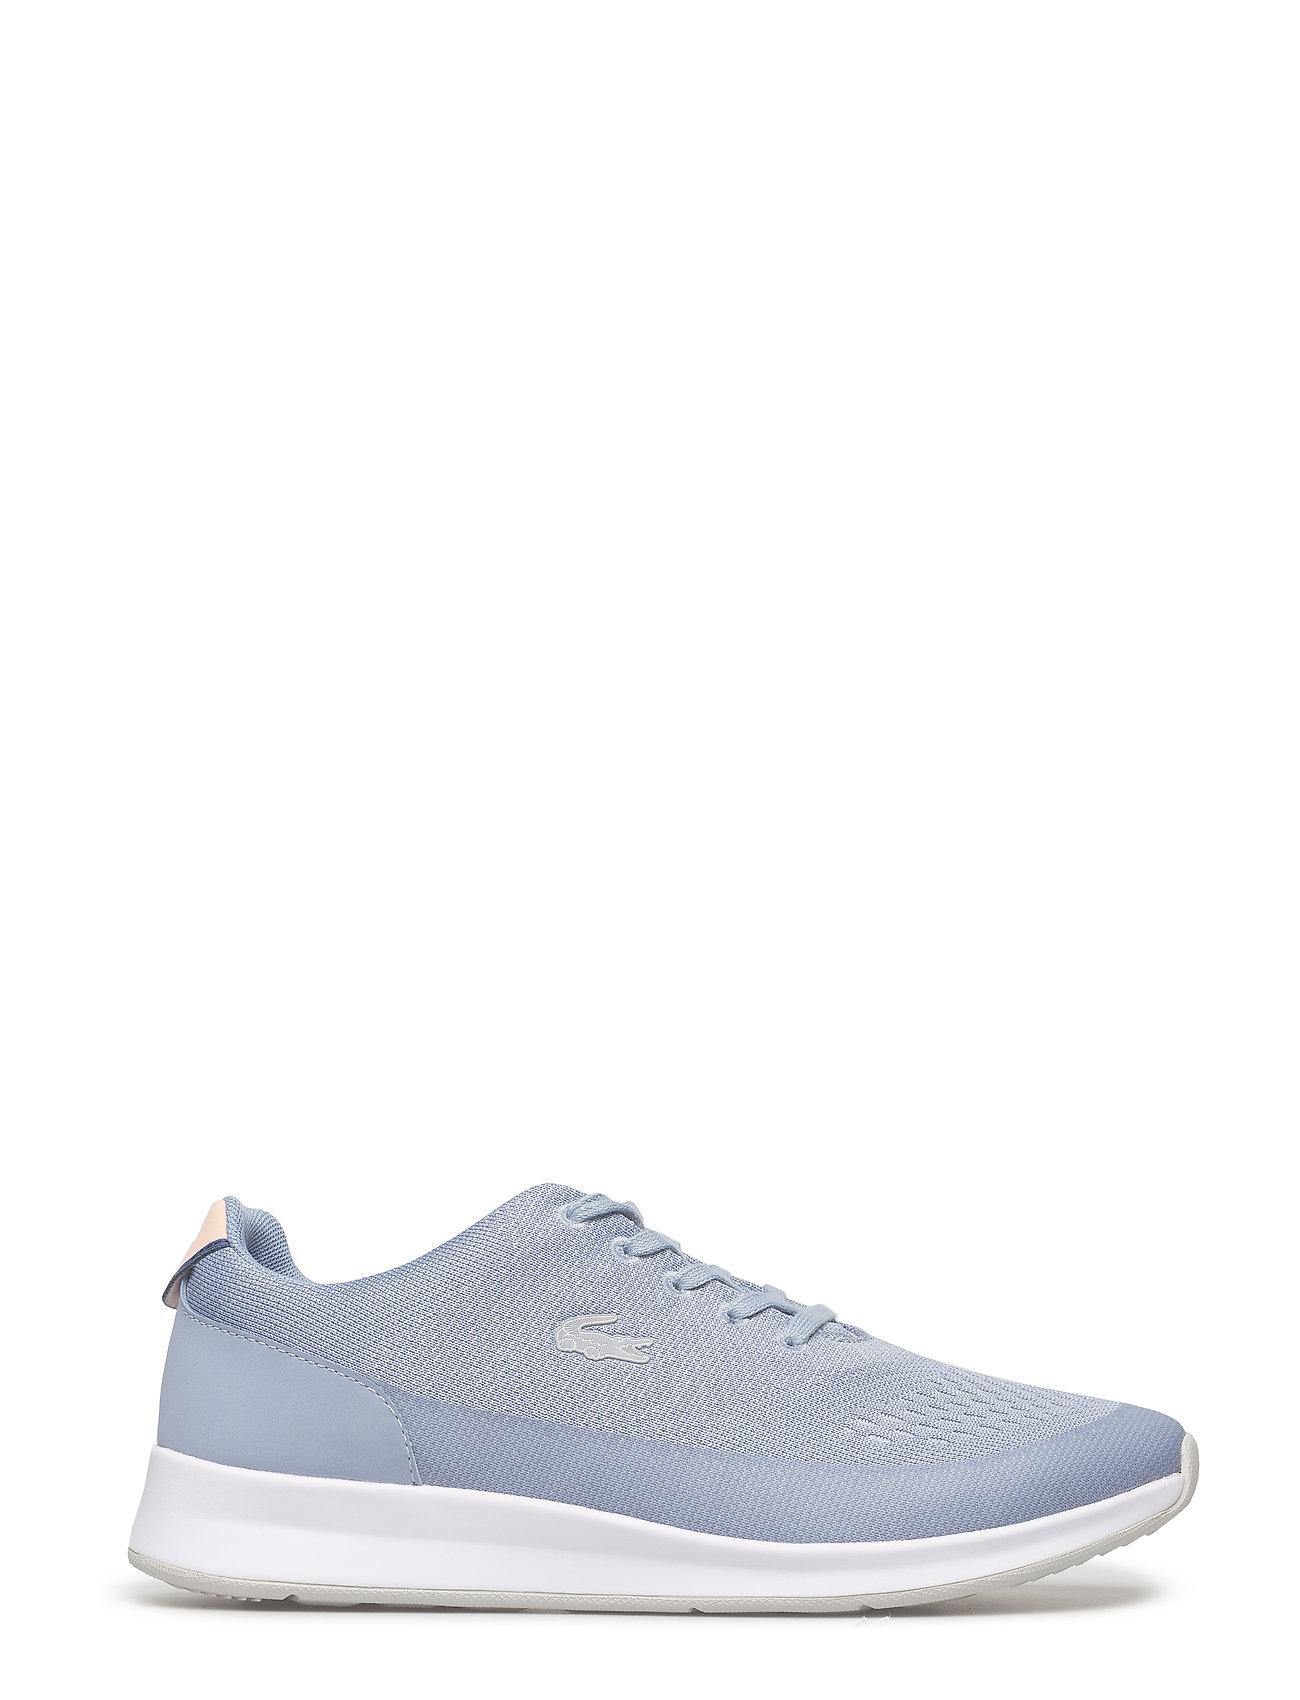 c08c0b7cd16 Lacoste sneakers – Chaumont 118 3 til dame i L BLU/L PNK TXT/SYN ...